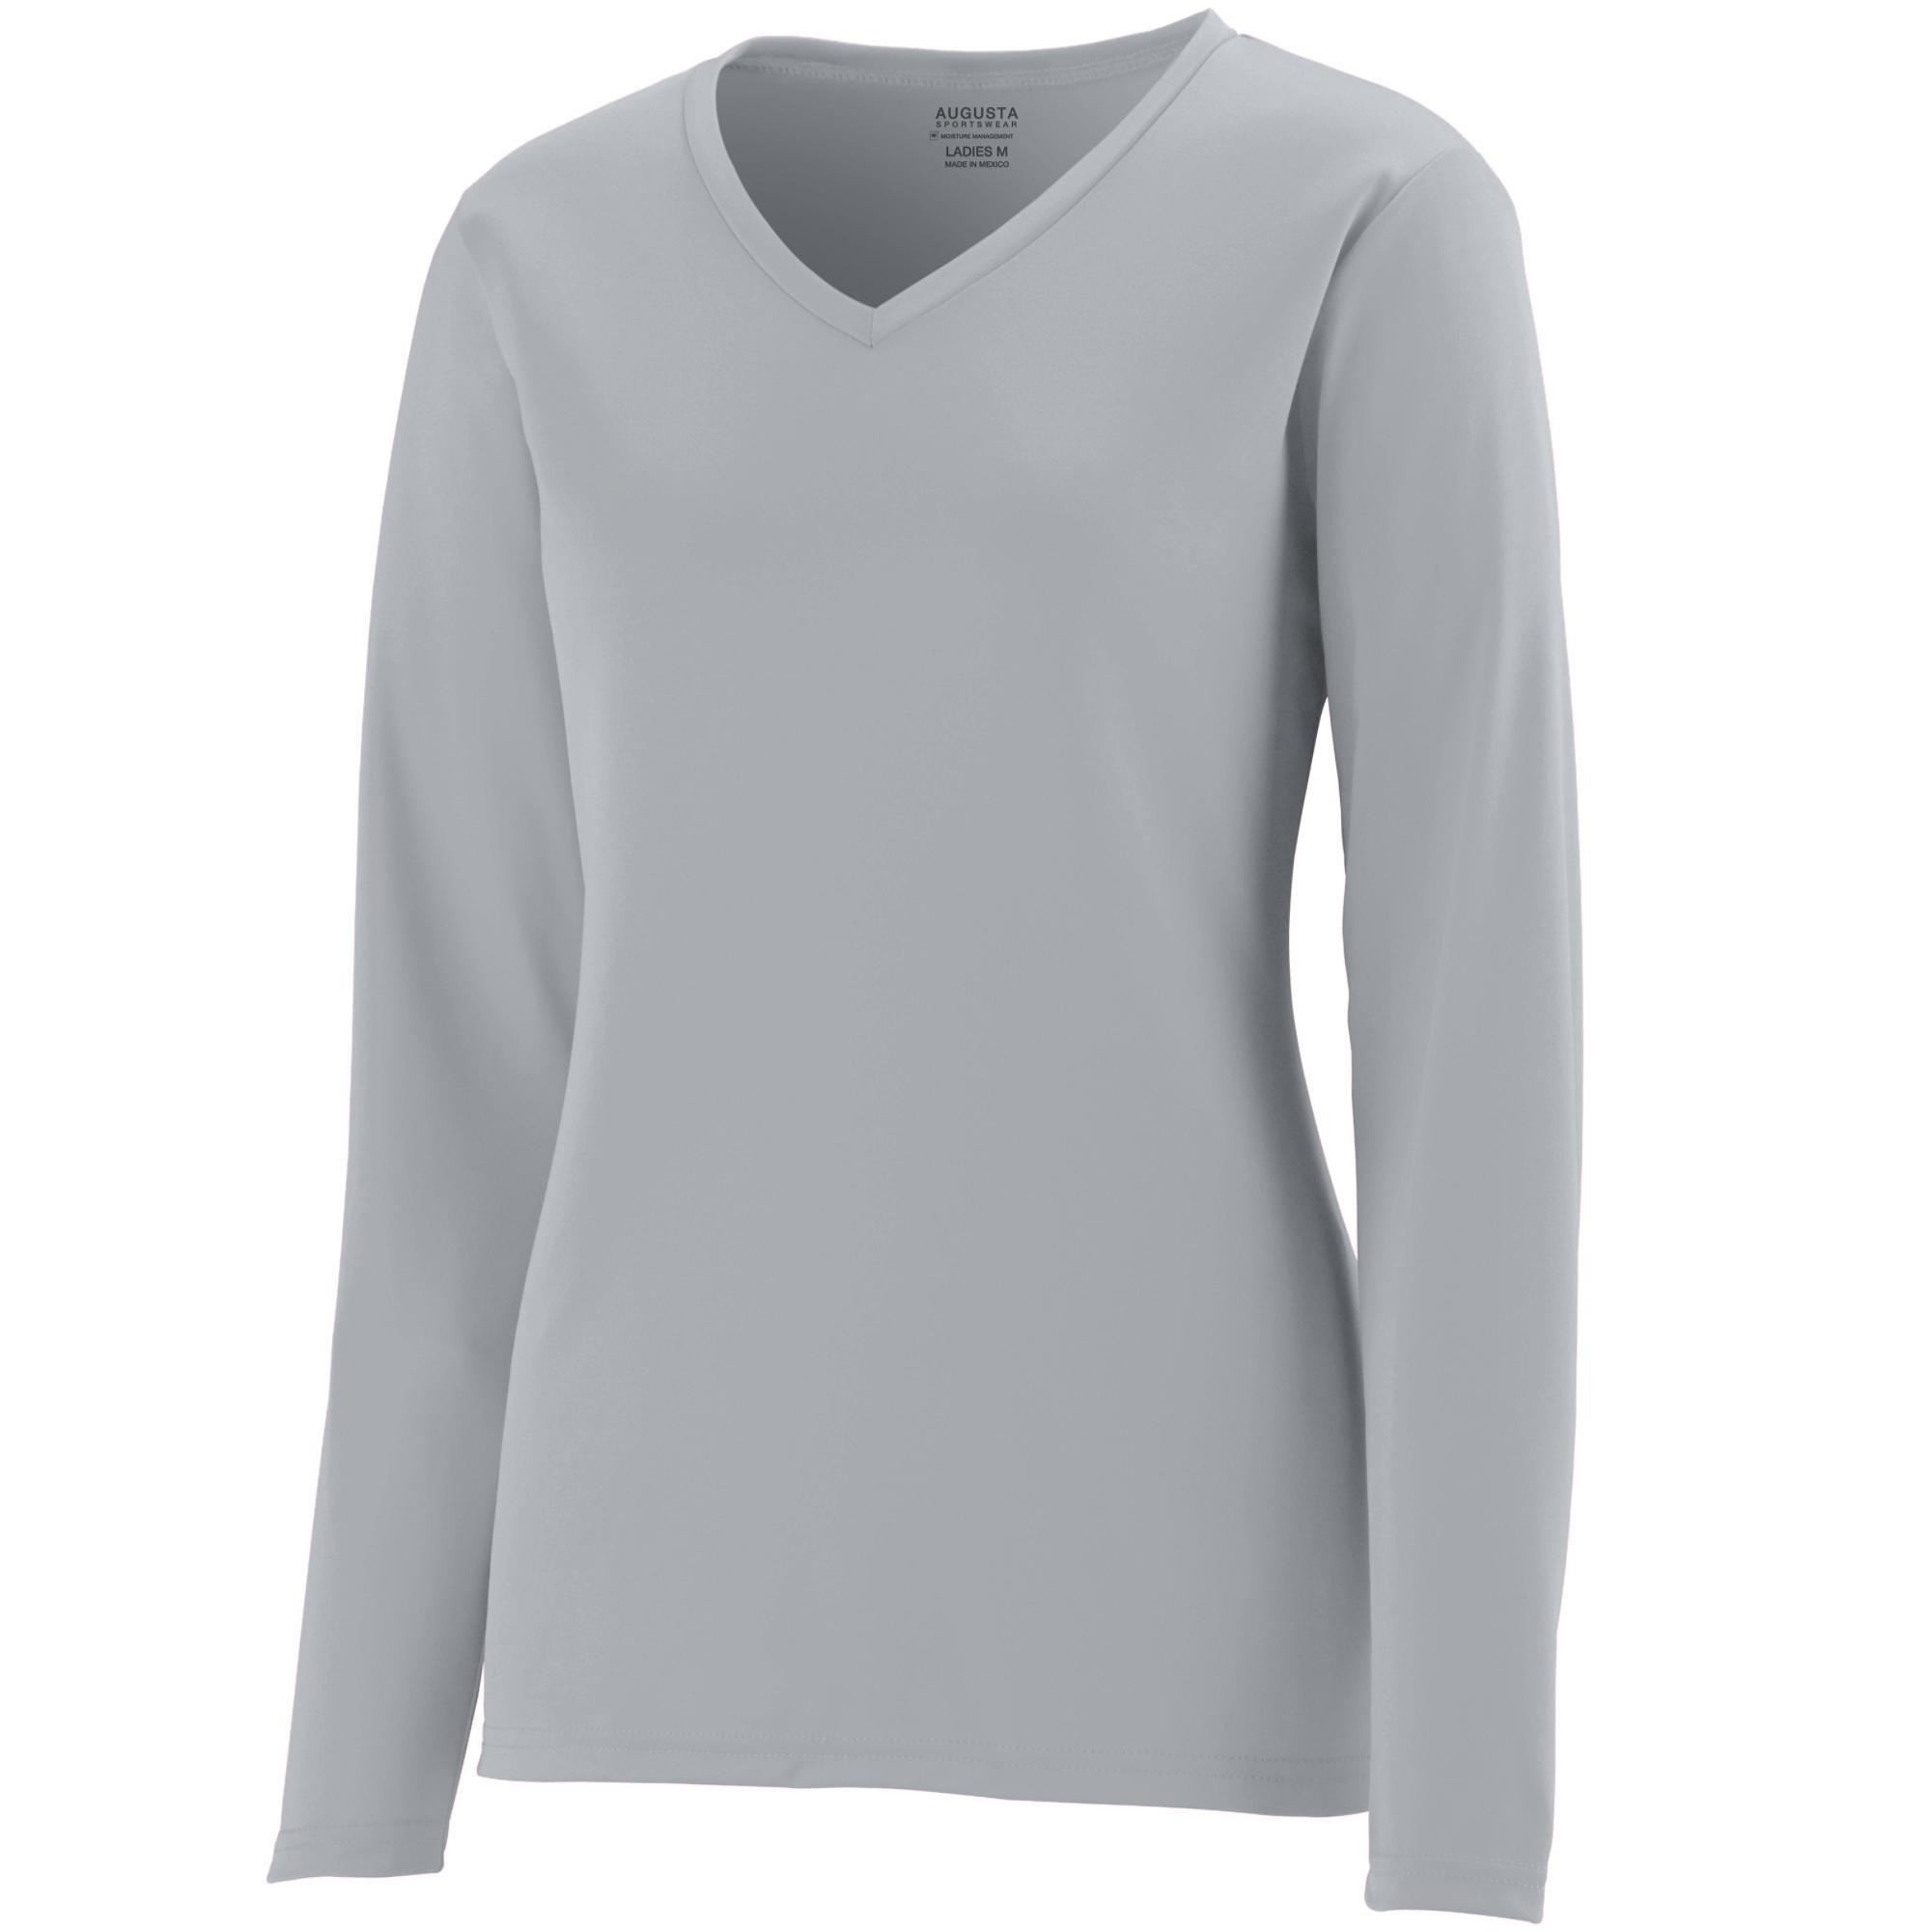 Augusta Sportswear Womens Long Sleeve Wicking T-Shirt, Silver Grey, 3X-Large